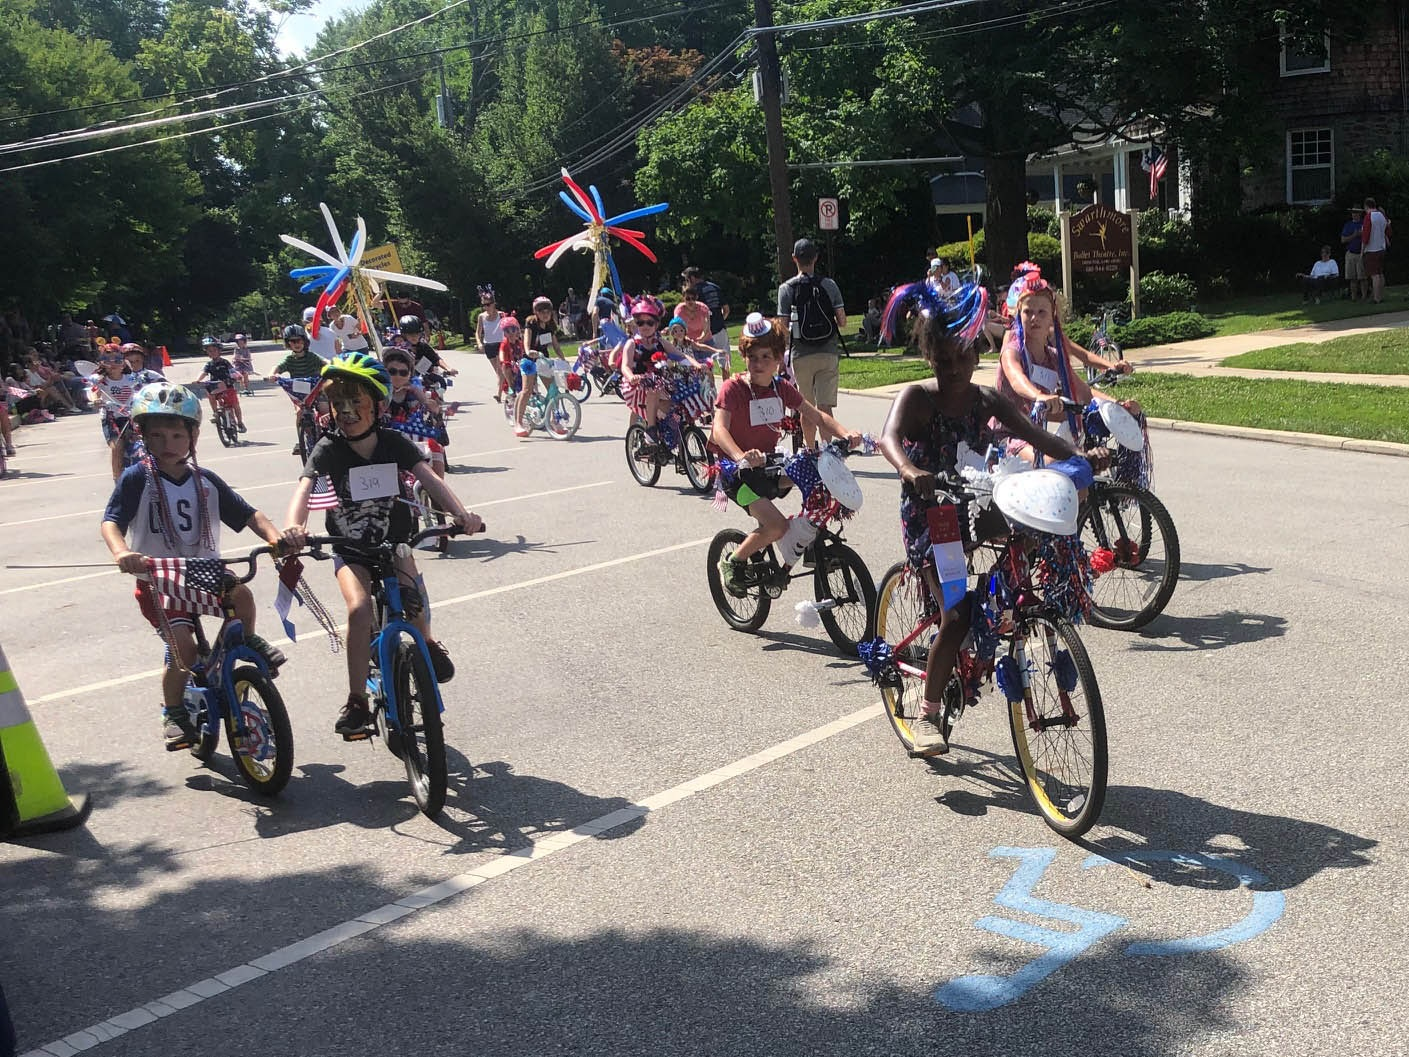 Independence Day bike parade in Swarthmore